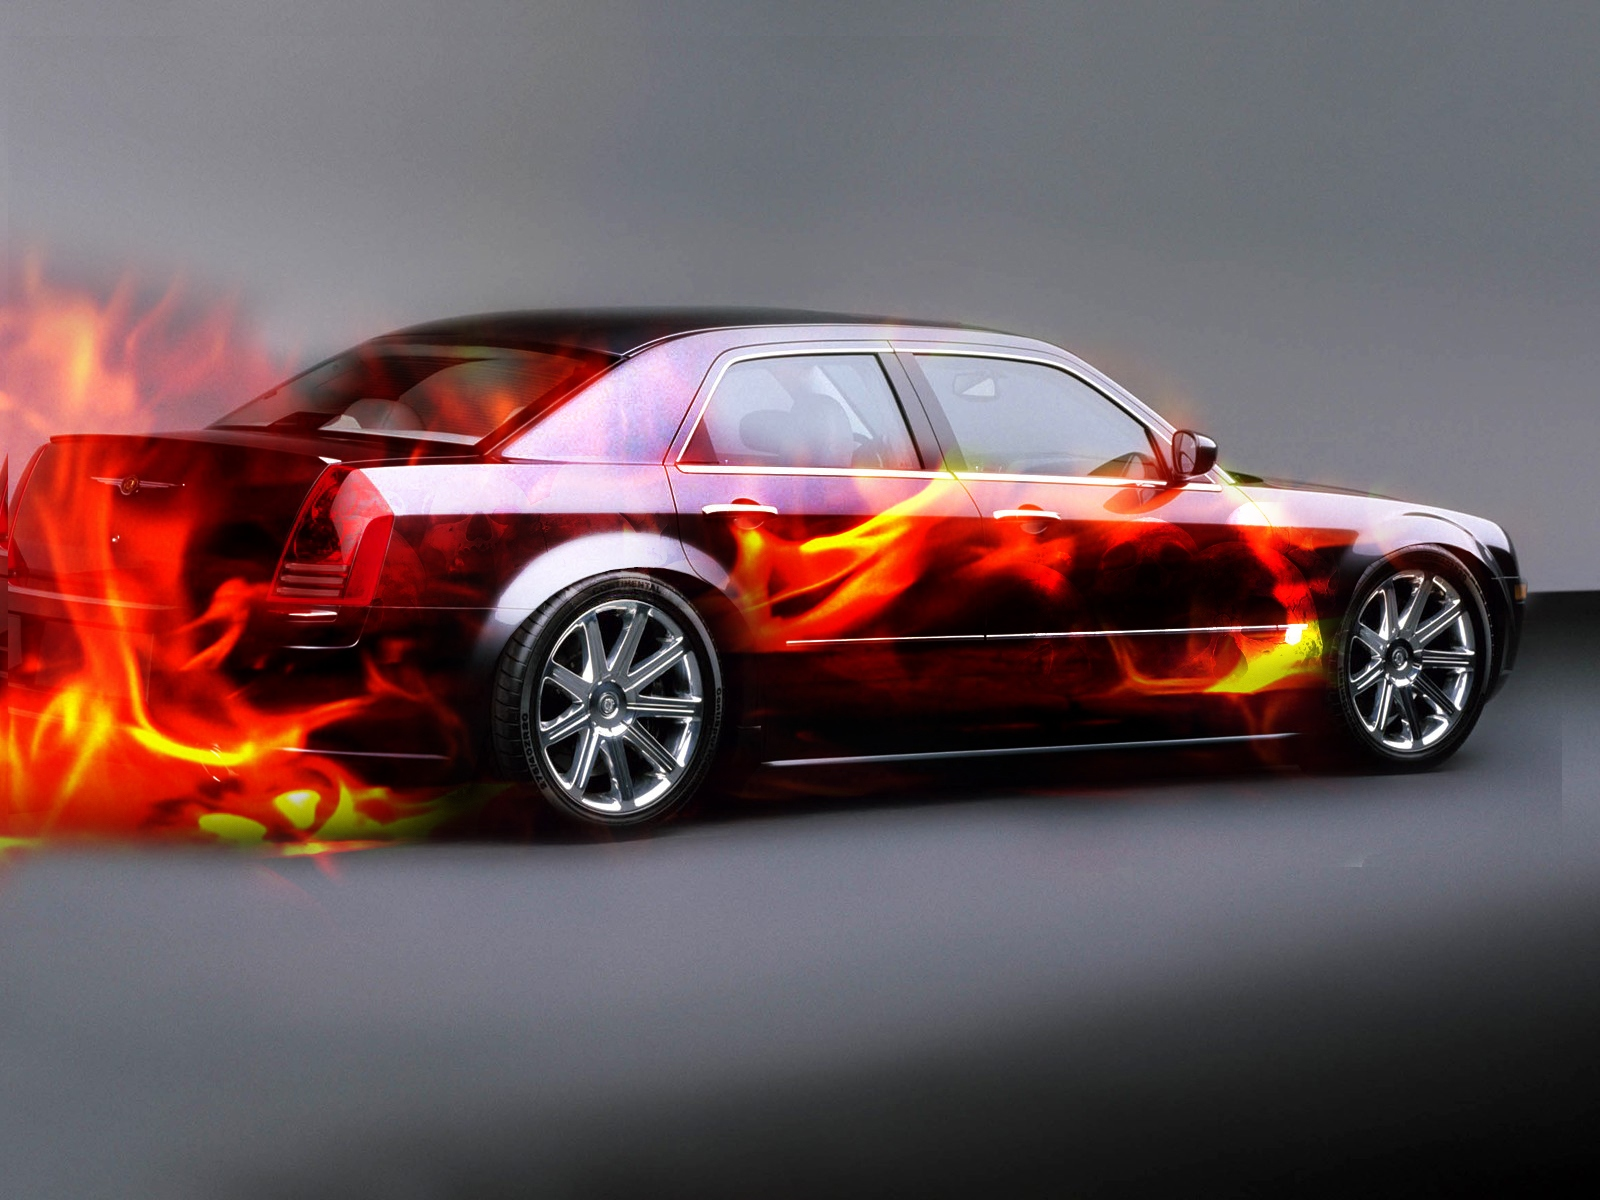 HD Cars Wallpaper Custom Car Wallpapers 1600x1200